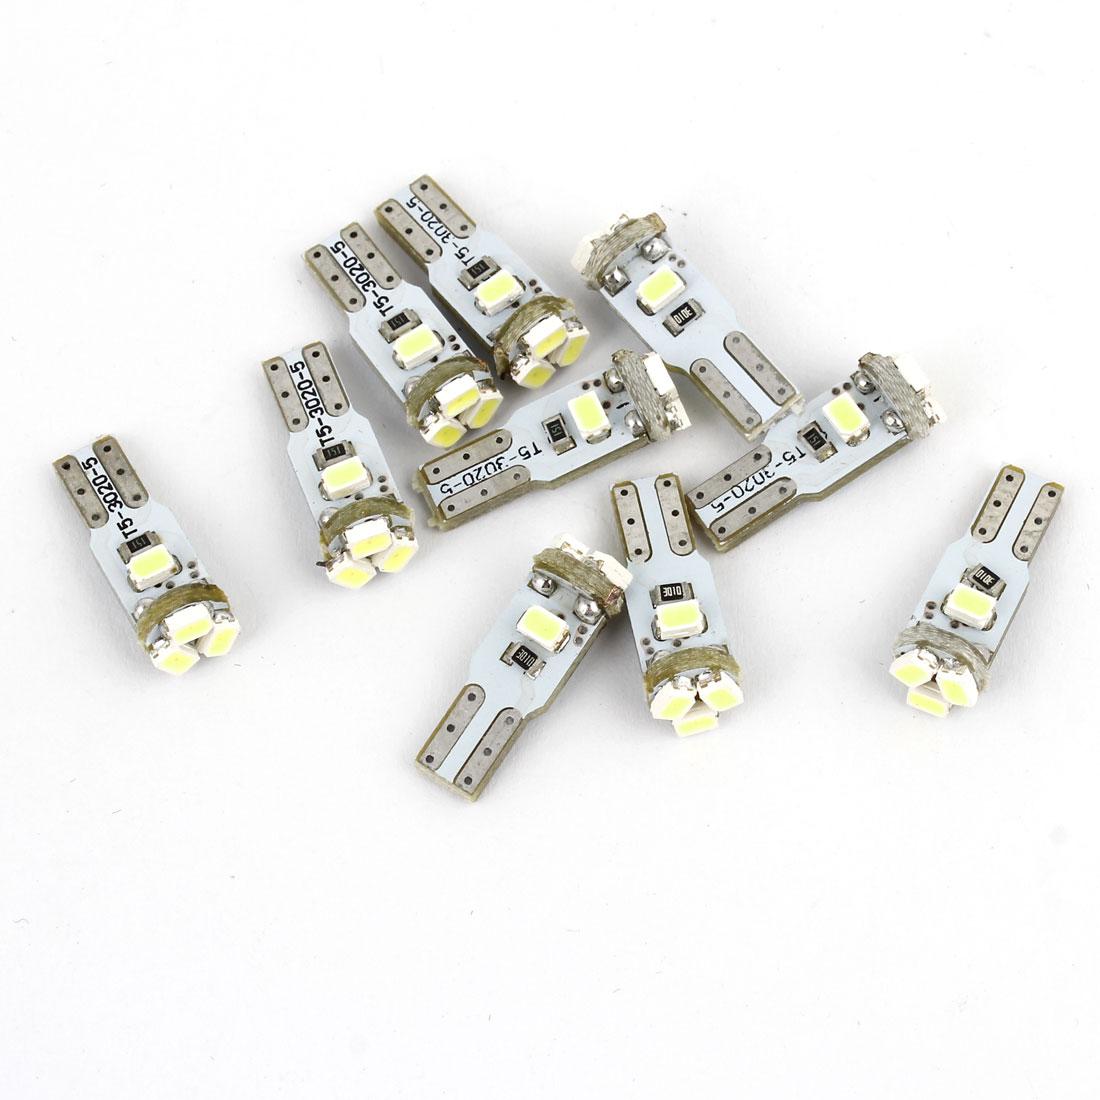 10 Pcs White 5 3020 LED T5 Turck Van Dashboard Lights Lamps Bulbs Internal